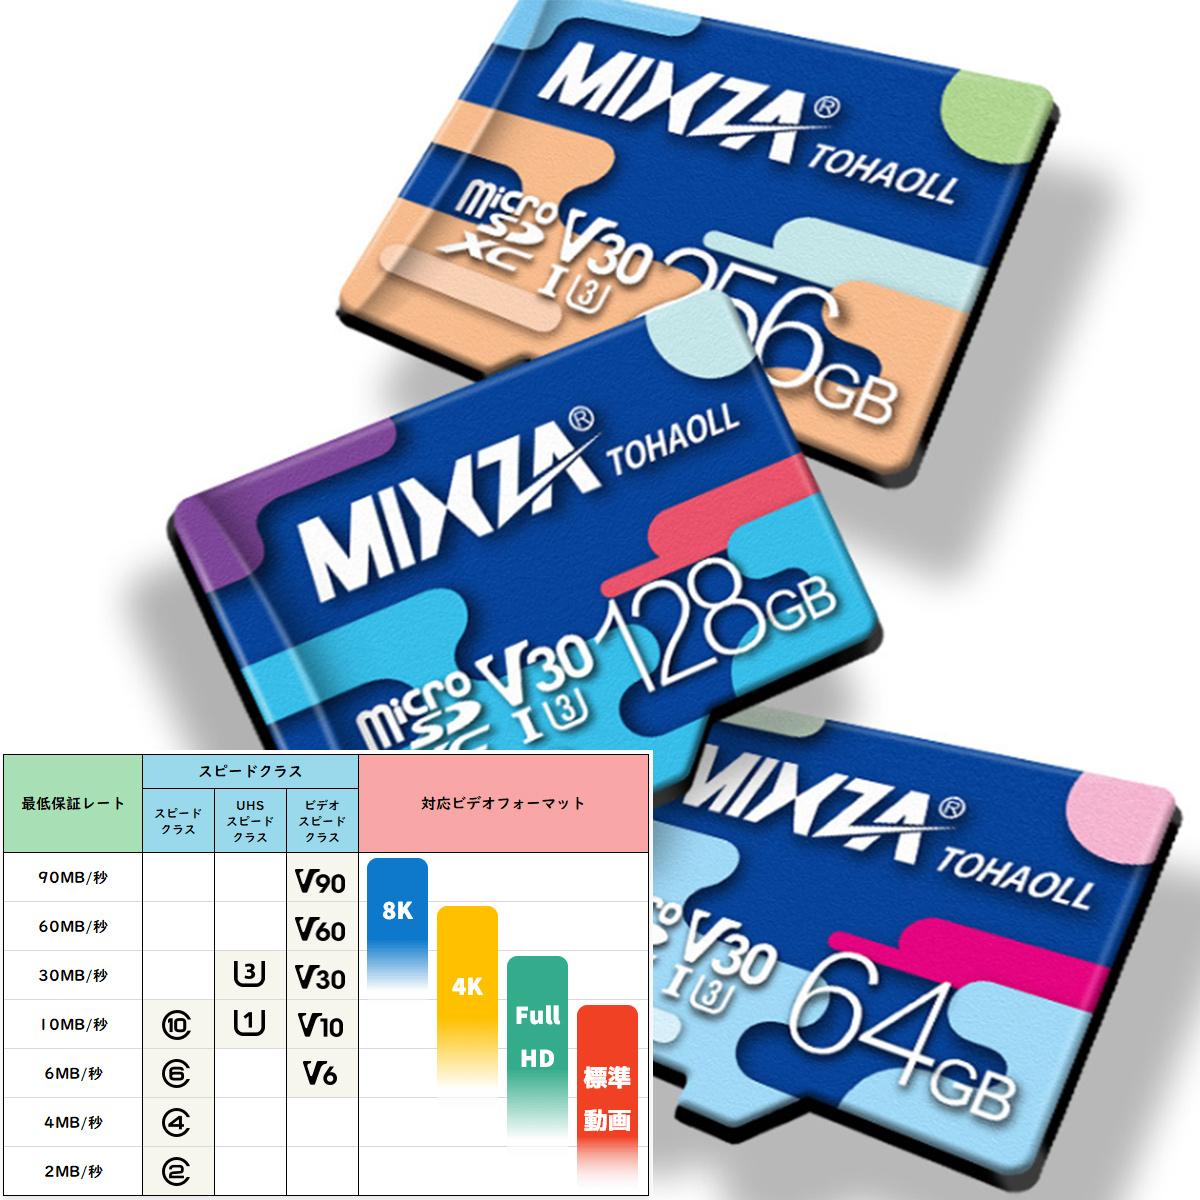 MicroSD 32GB UHS-I 超高速最大80MB/sec MicroSDカード マイクロSD microSDHC 300x SDカード変換アダプタ USBカードリーダー付 SDM便送料無料 1年保証 K&M